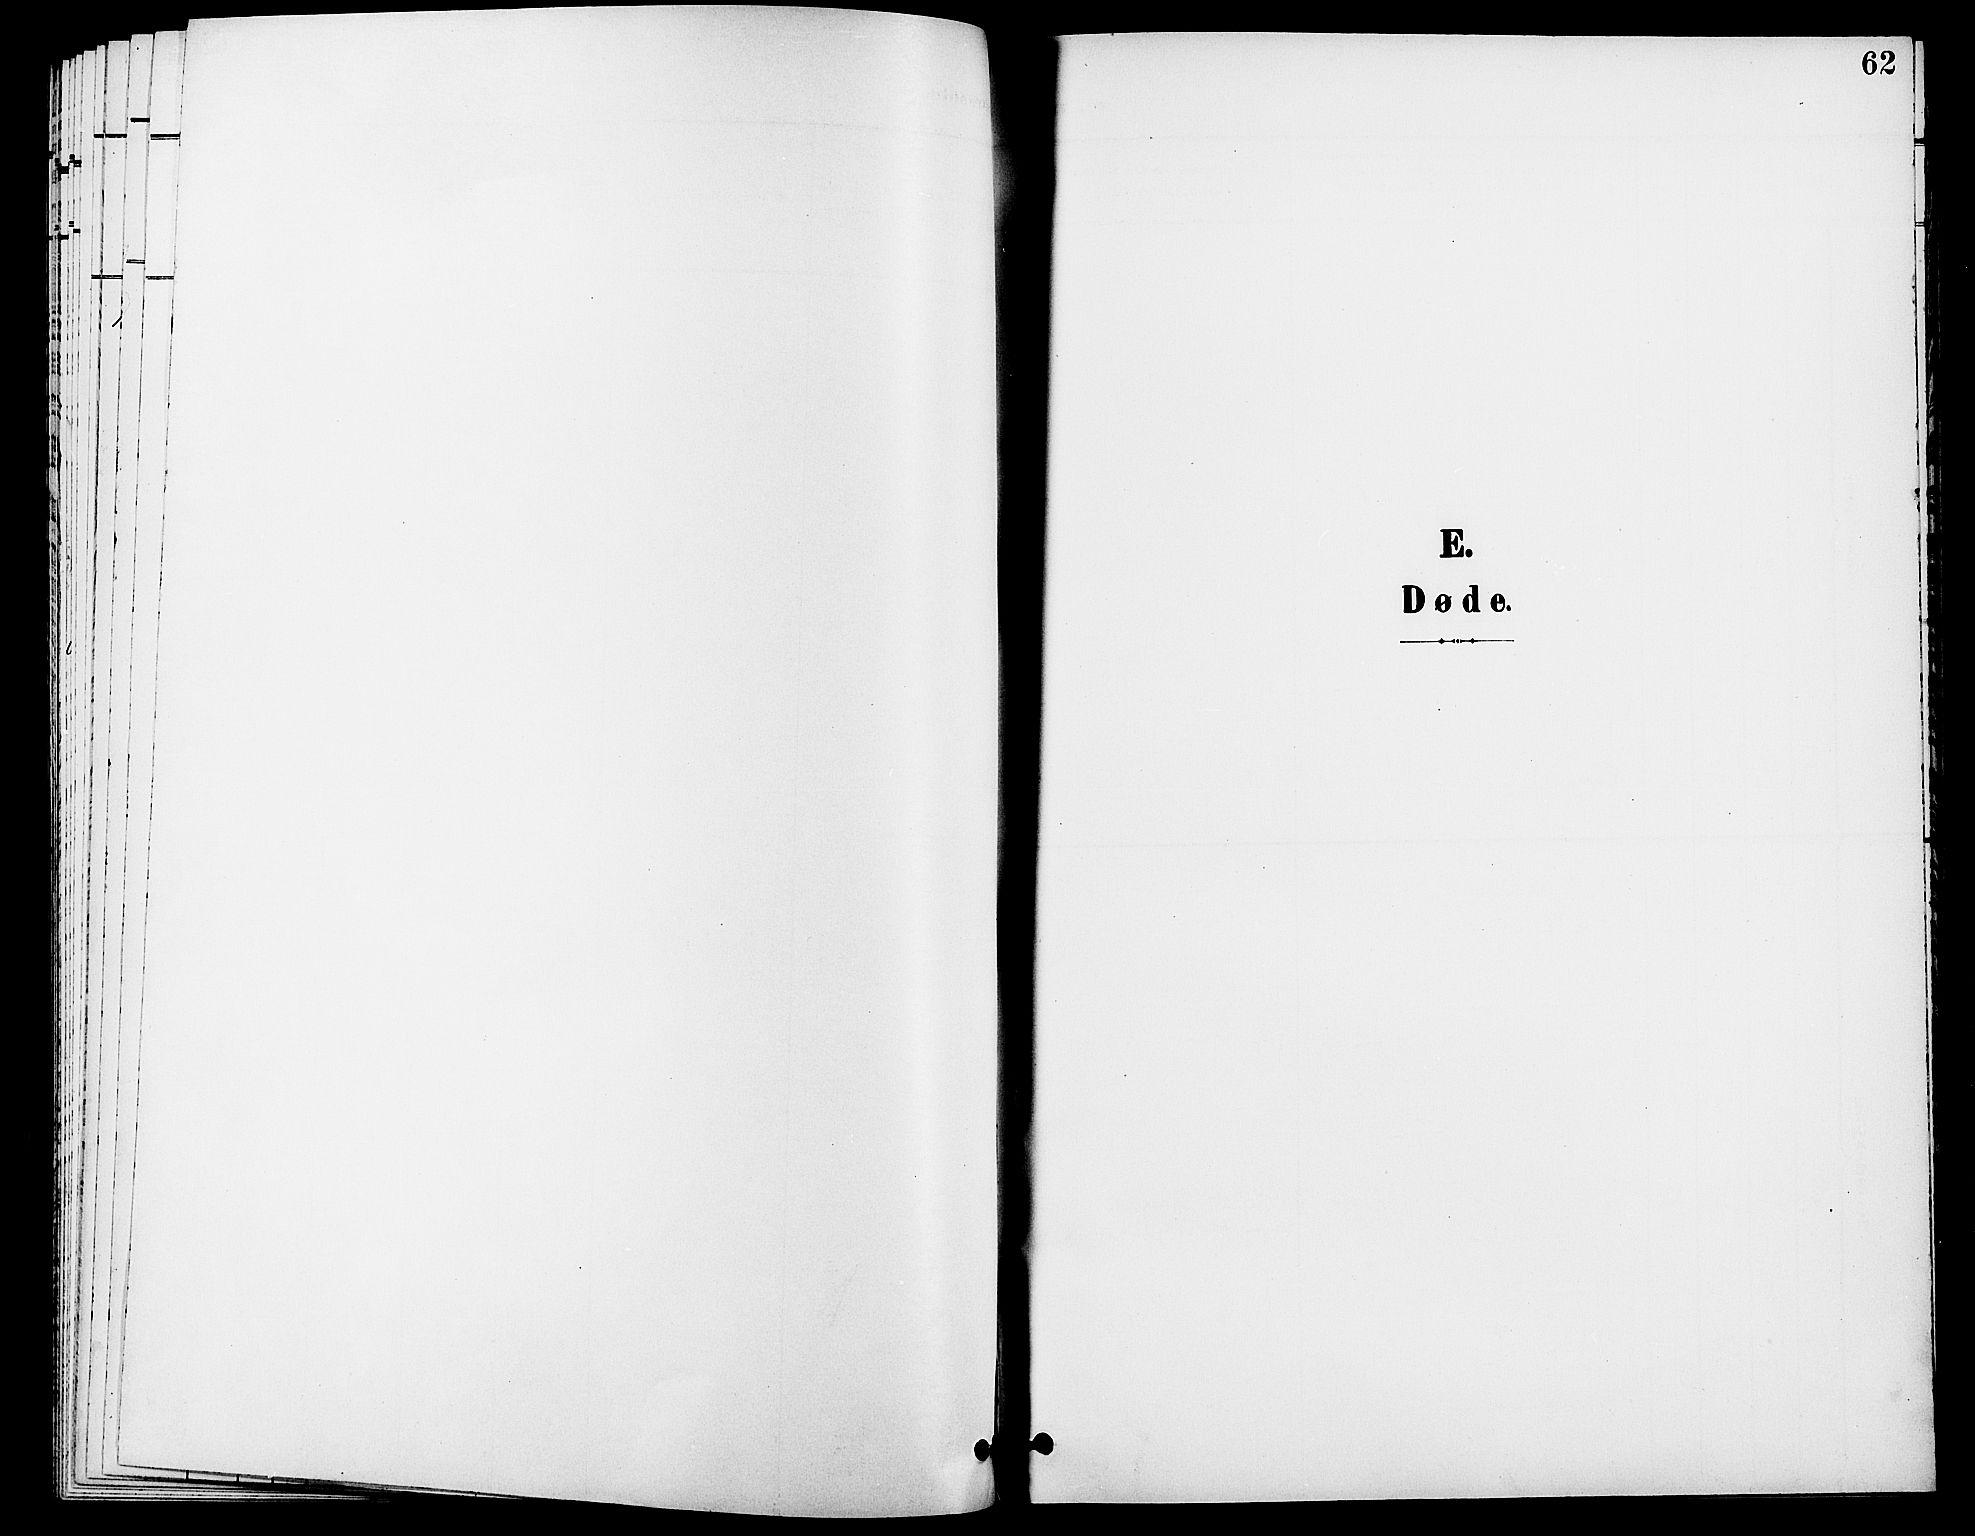 SAH, Rendalen prestekontor, H/Ha/Haa/L0008: Ministerialbok nr. 8, 1898-1910, s. 62